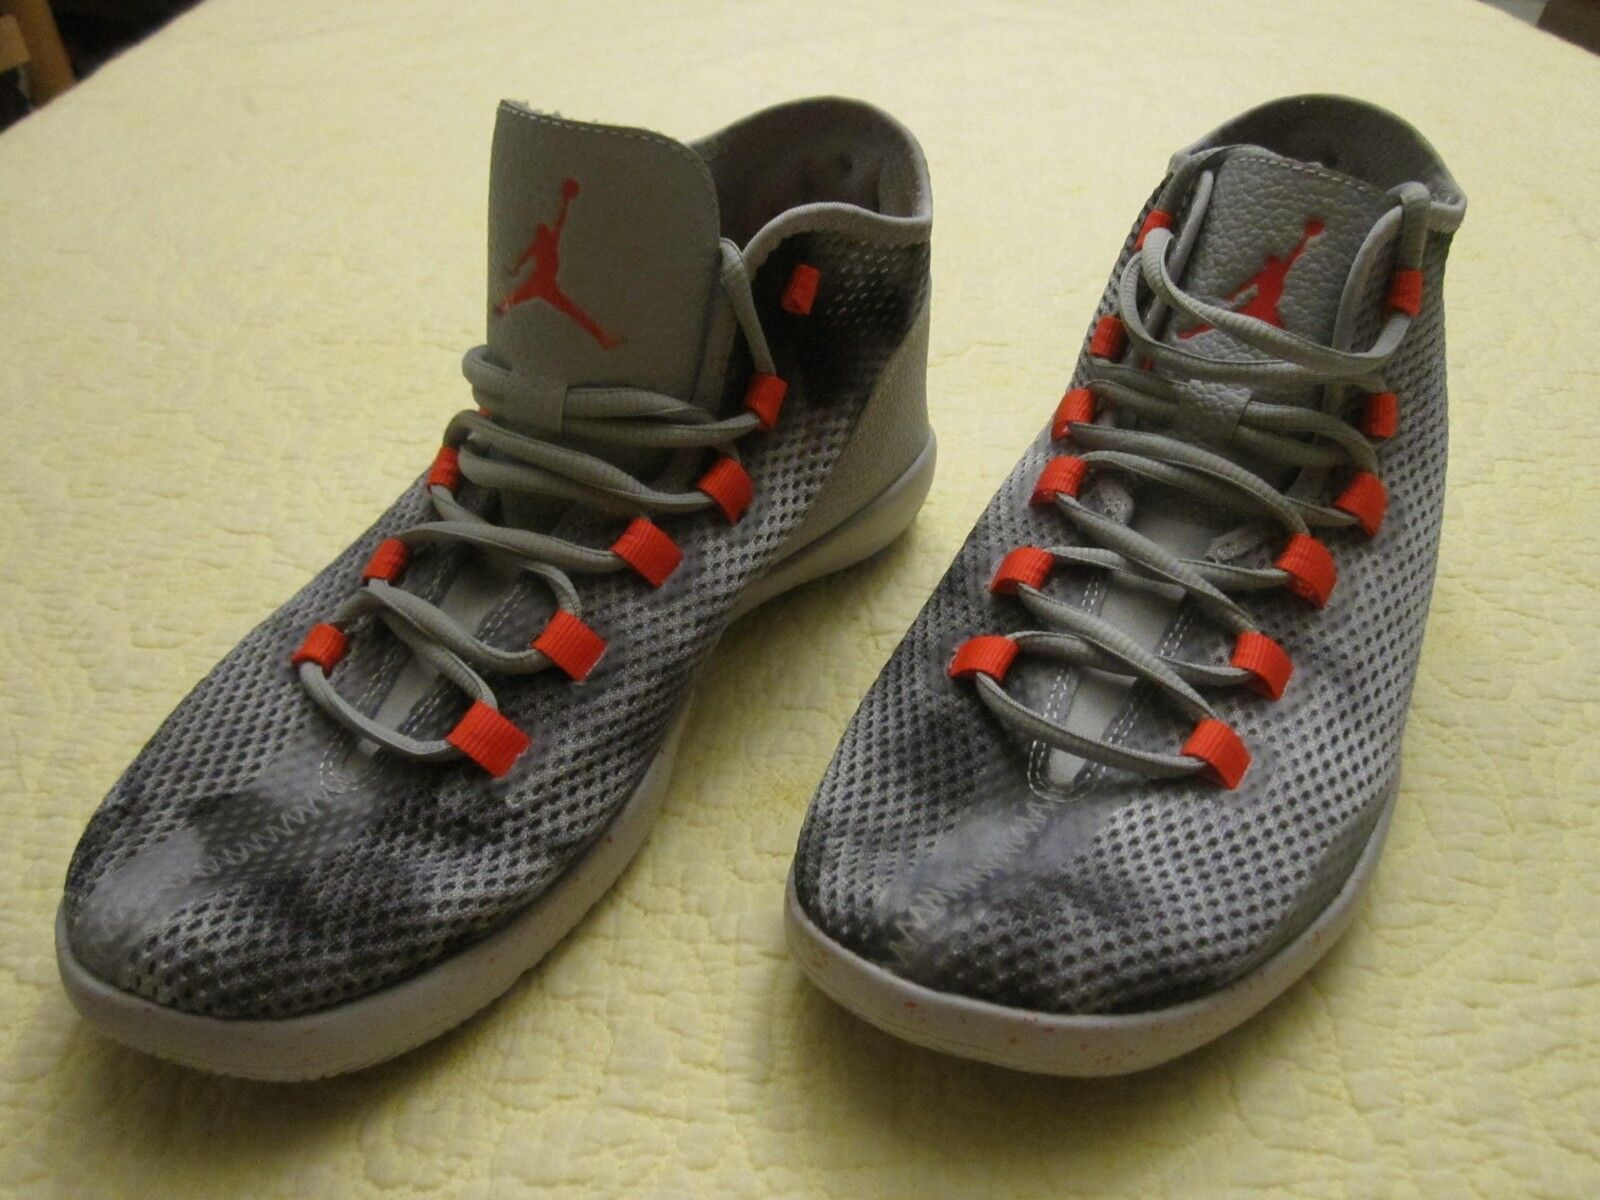 Nuove nike jordan rivelano premio lupo sz grigio scarpe da basket sz lupo 9,5 (834229-015) c187f5